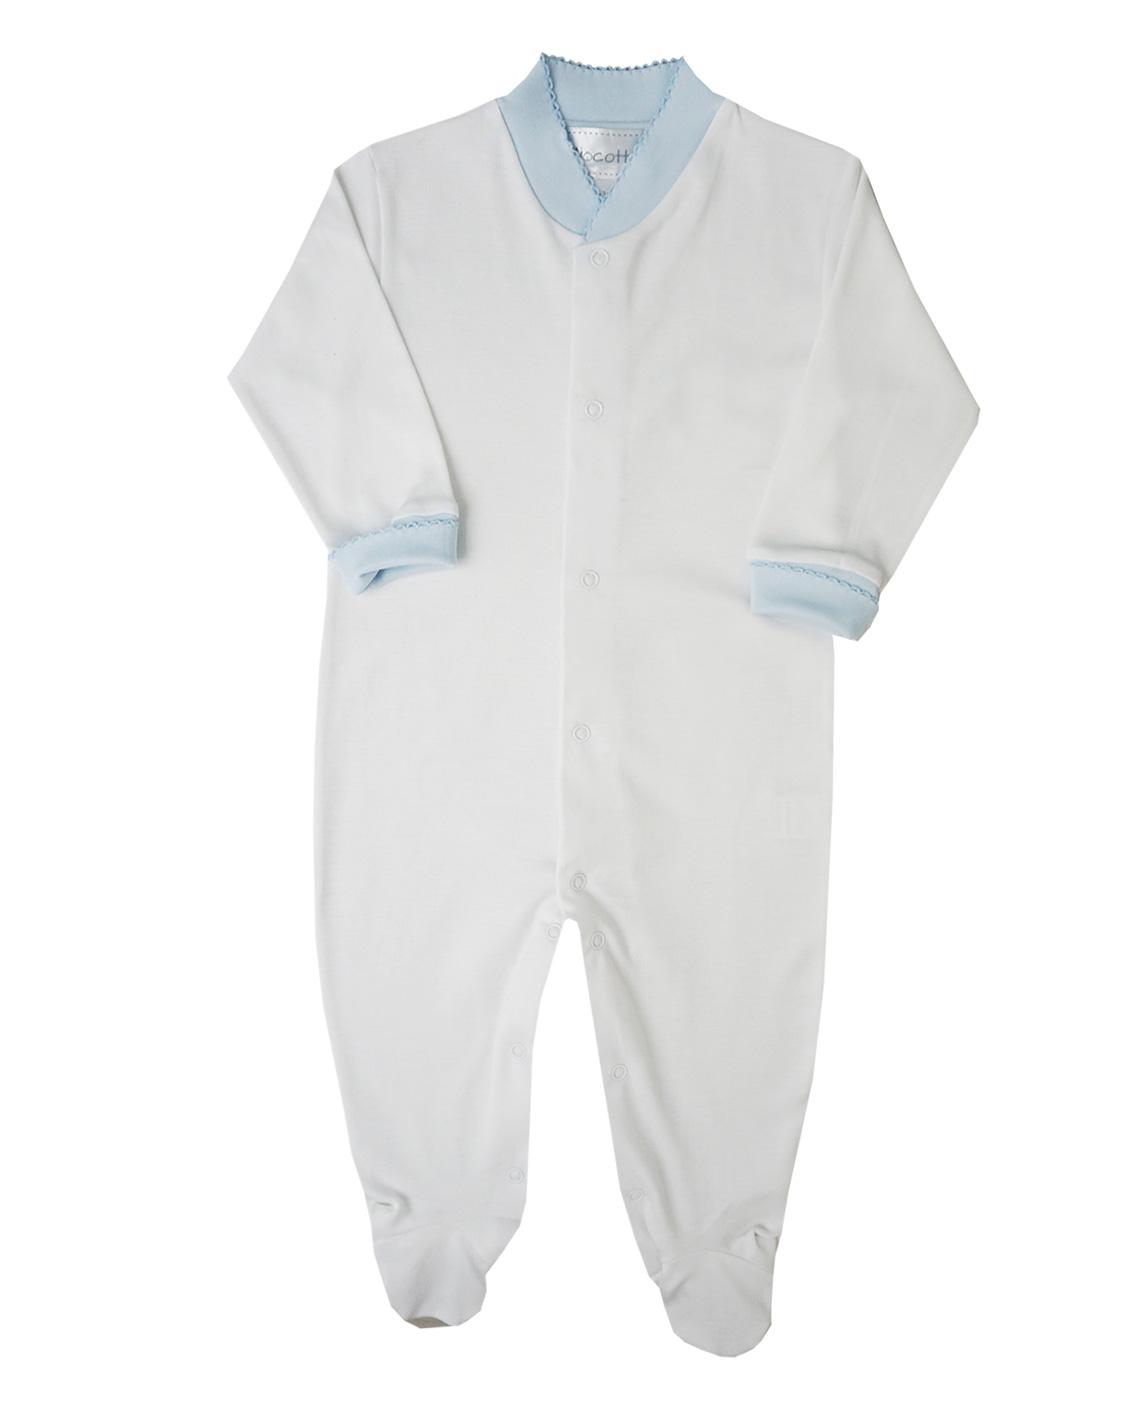 Pima Cotton Footie Basic Solid White Color Cuffs Ecch Pima Cotton